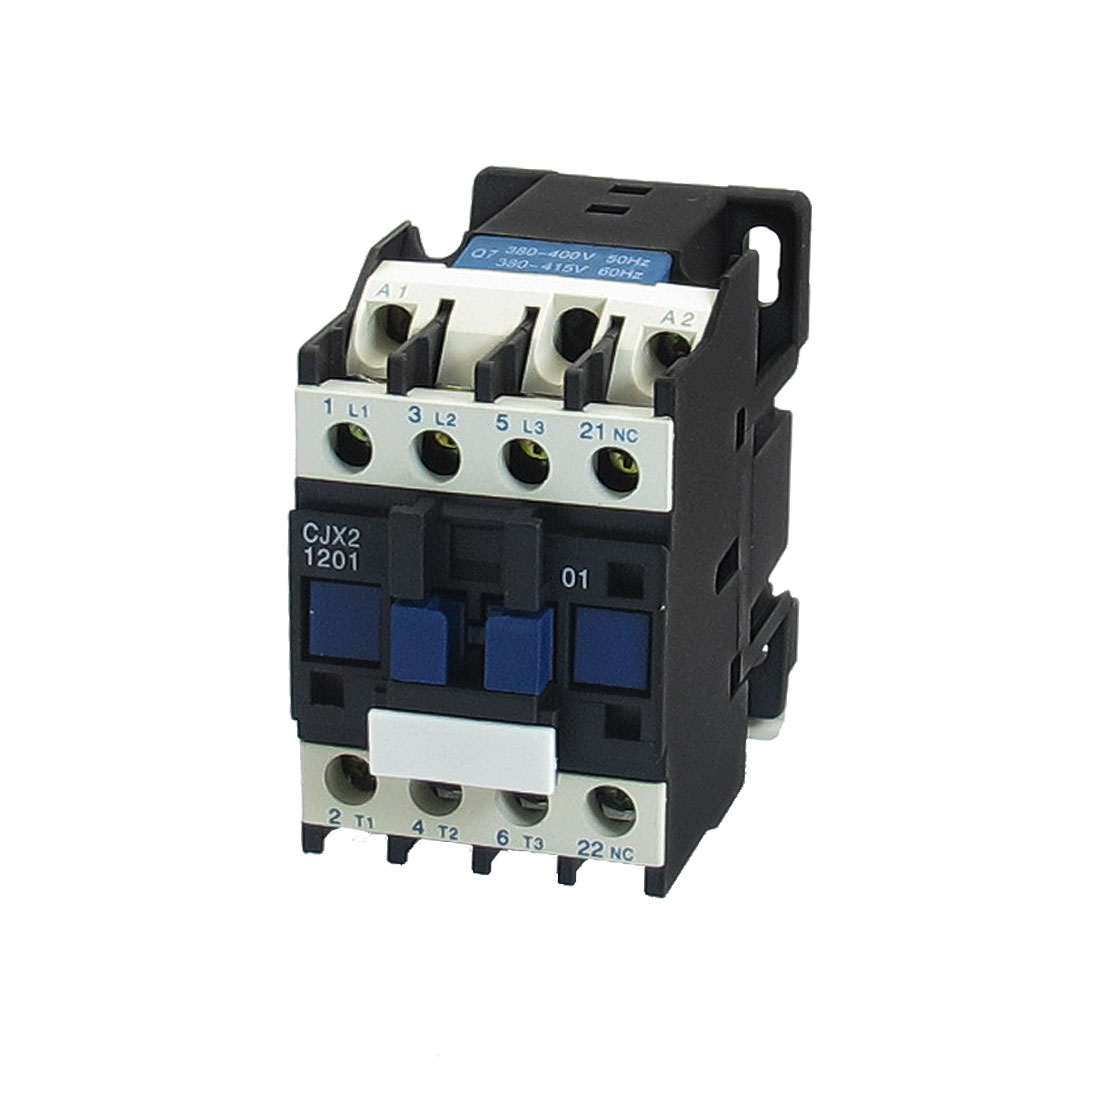 380-415V Coil Motor Controler AC Contactor 3P 3 Pole NC 660V 7.5KW CJX2-1201